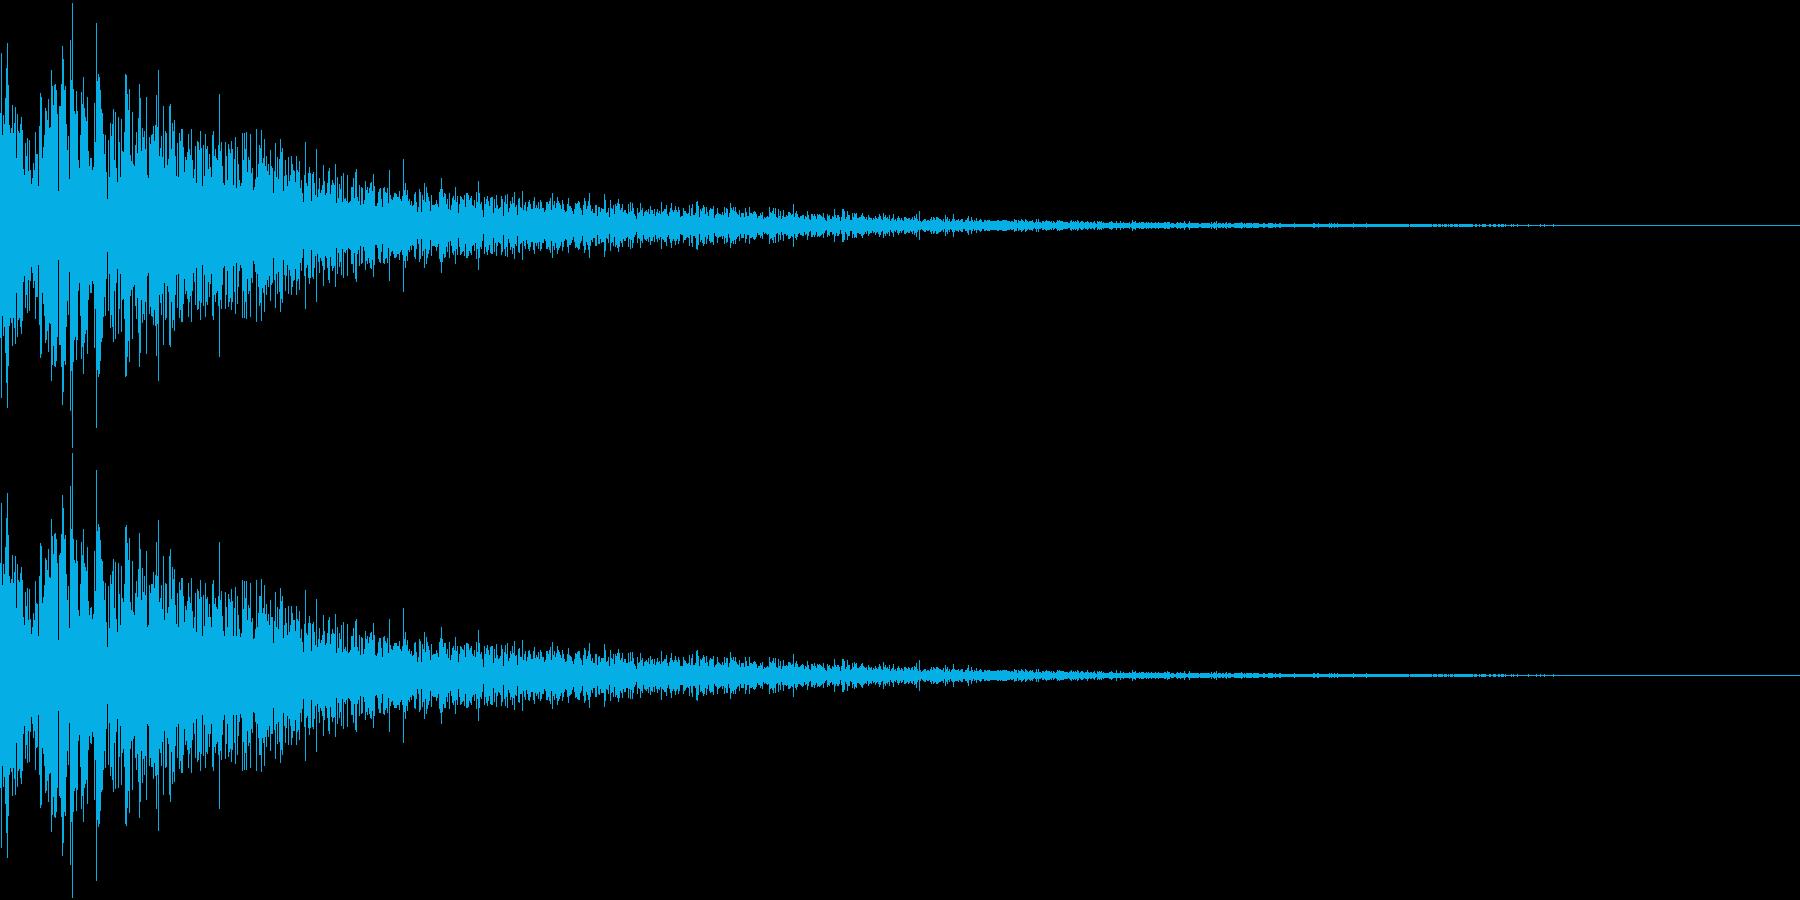 DTM Snare 6 オリジナル音源の再生済みの波形